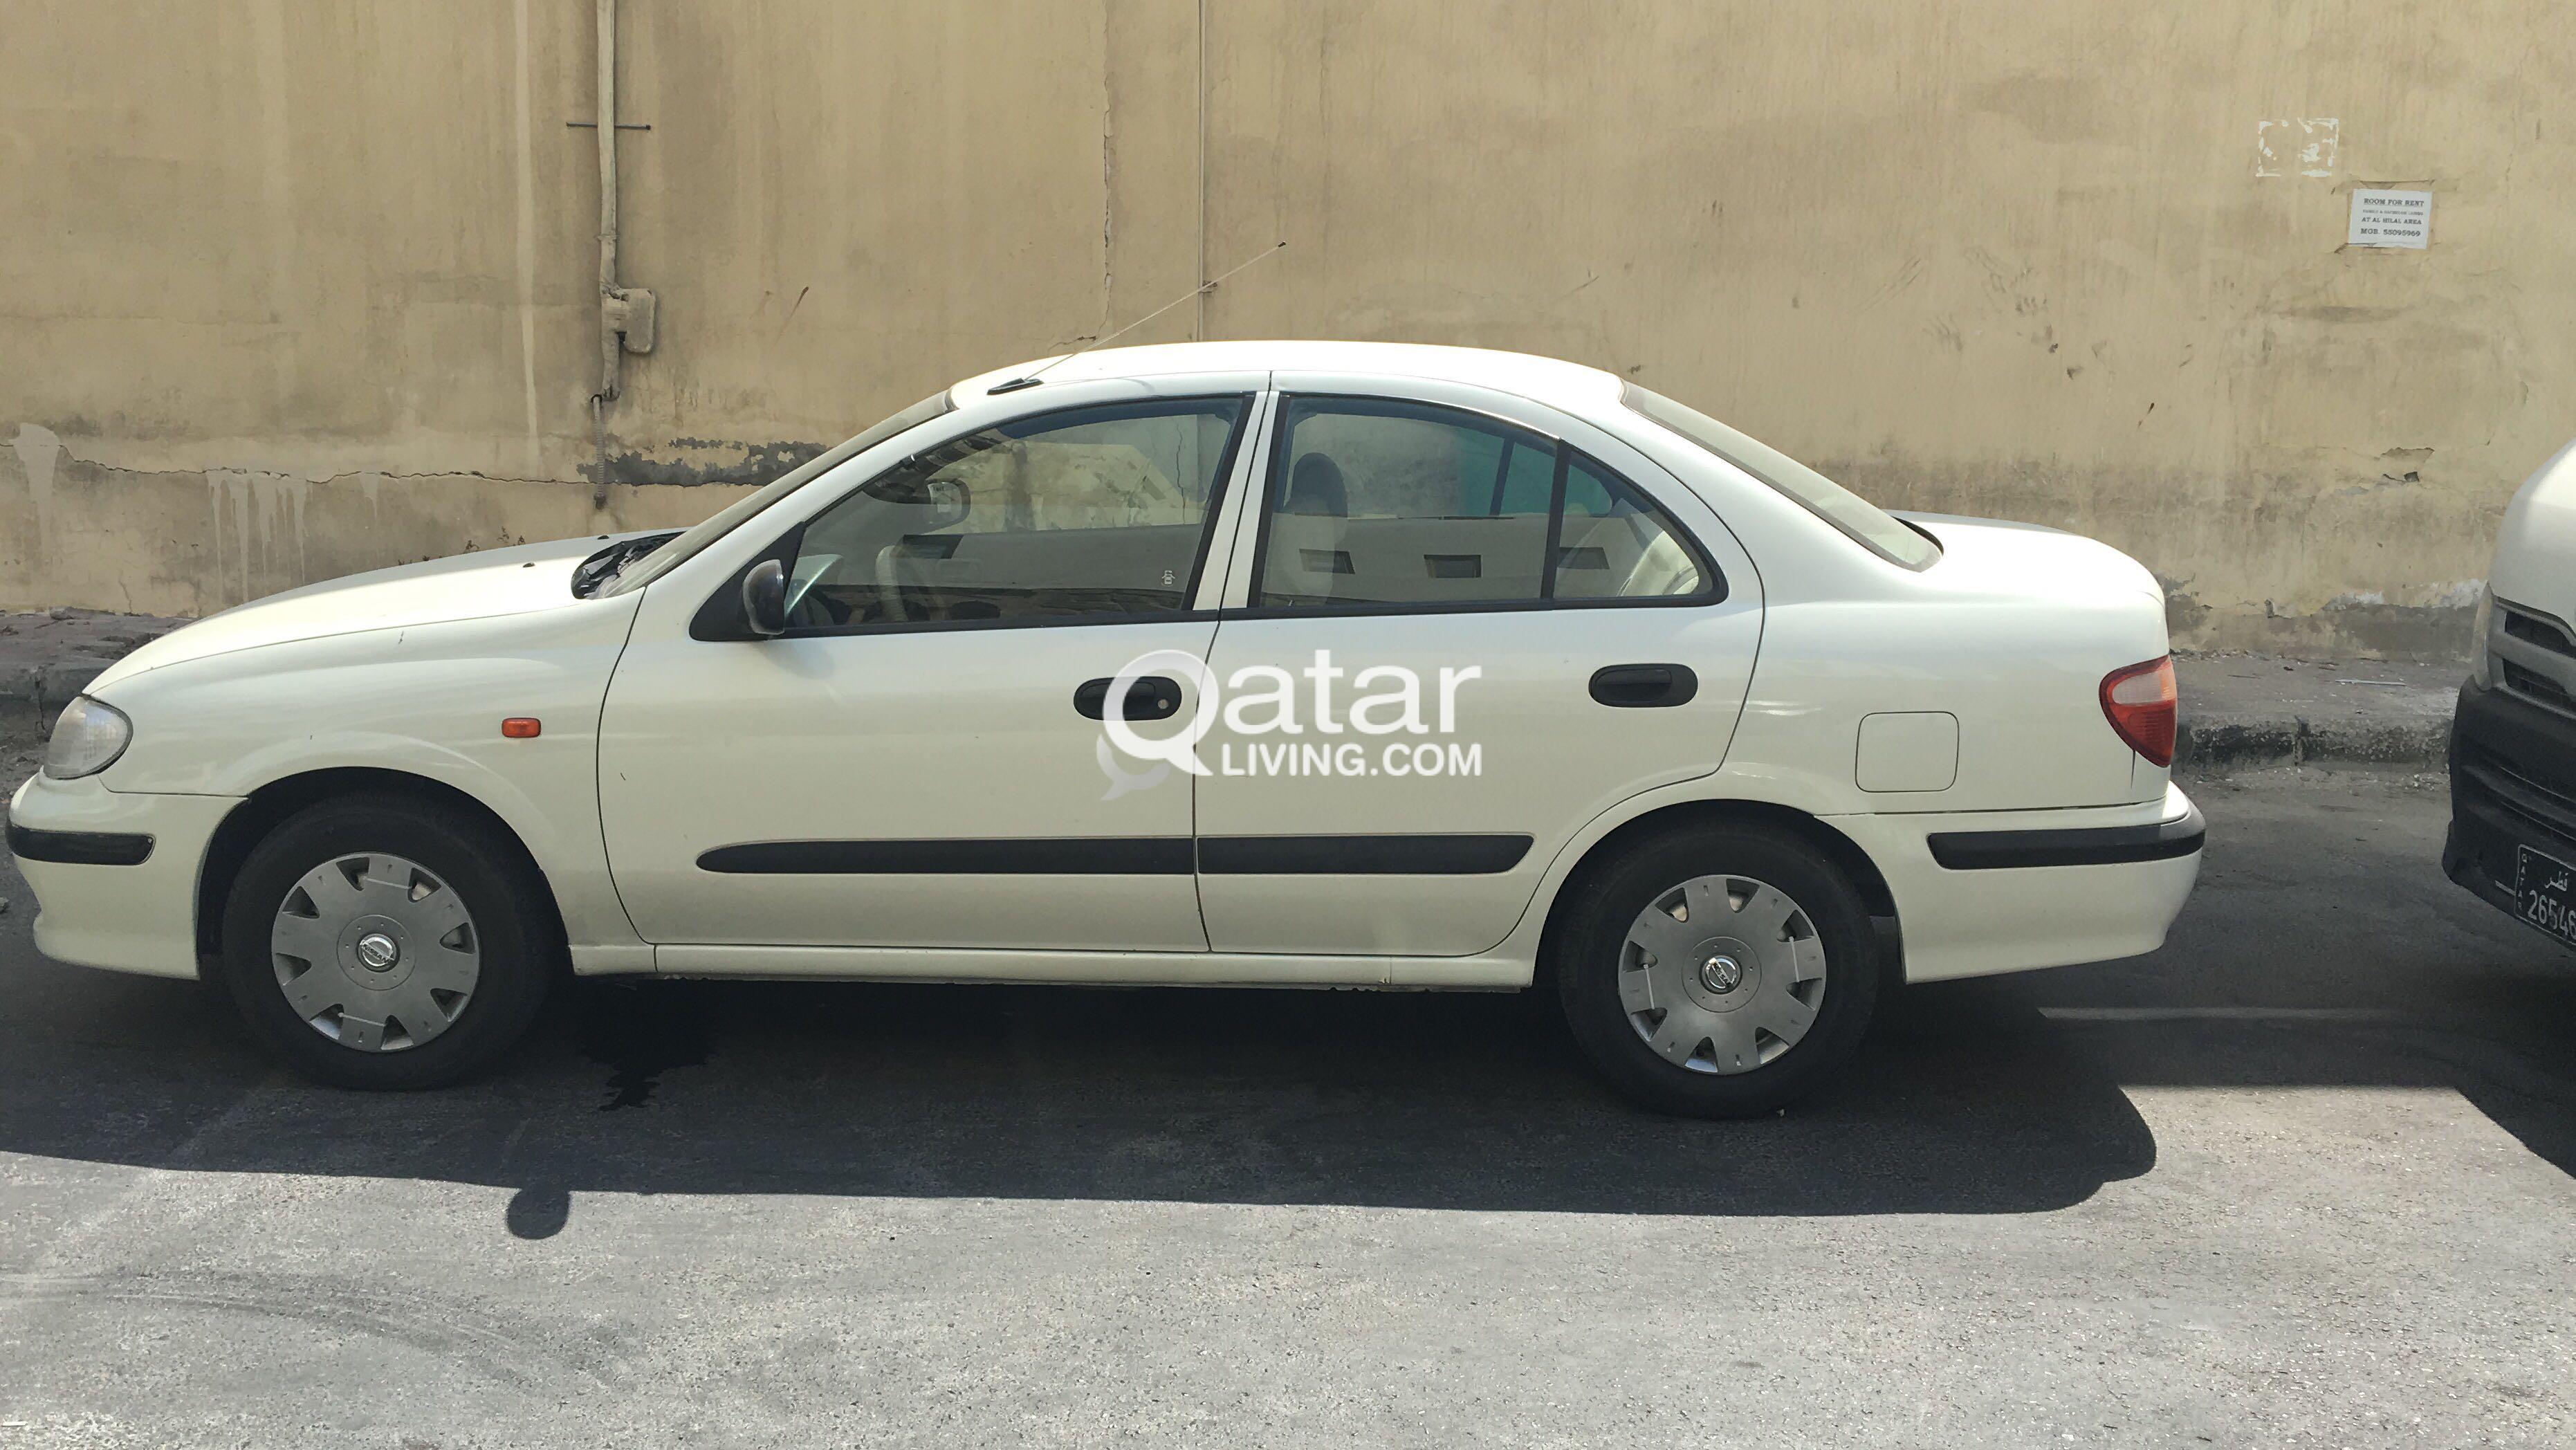 Nissan Sunny Japan Made 2003 Qatar Living